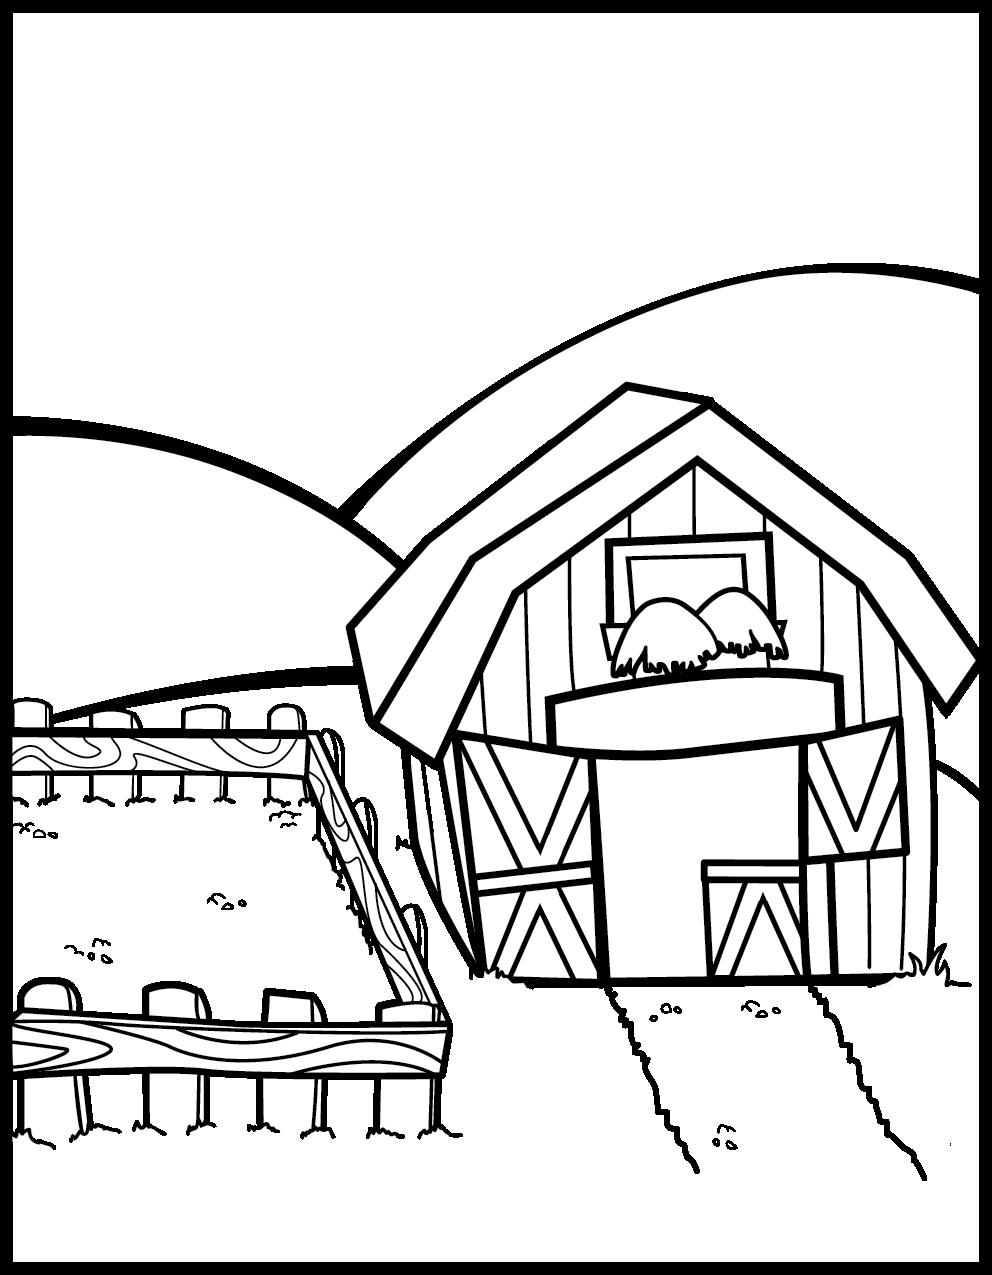 preschool coloring pages farm - photo#33